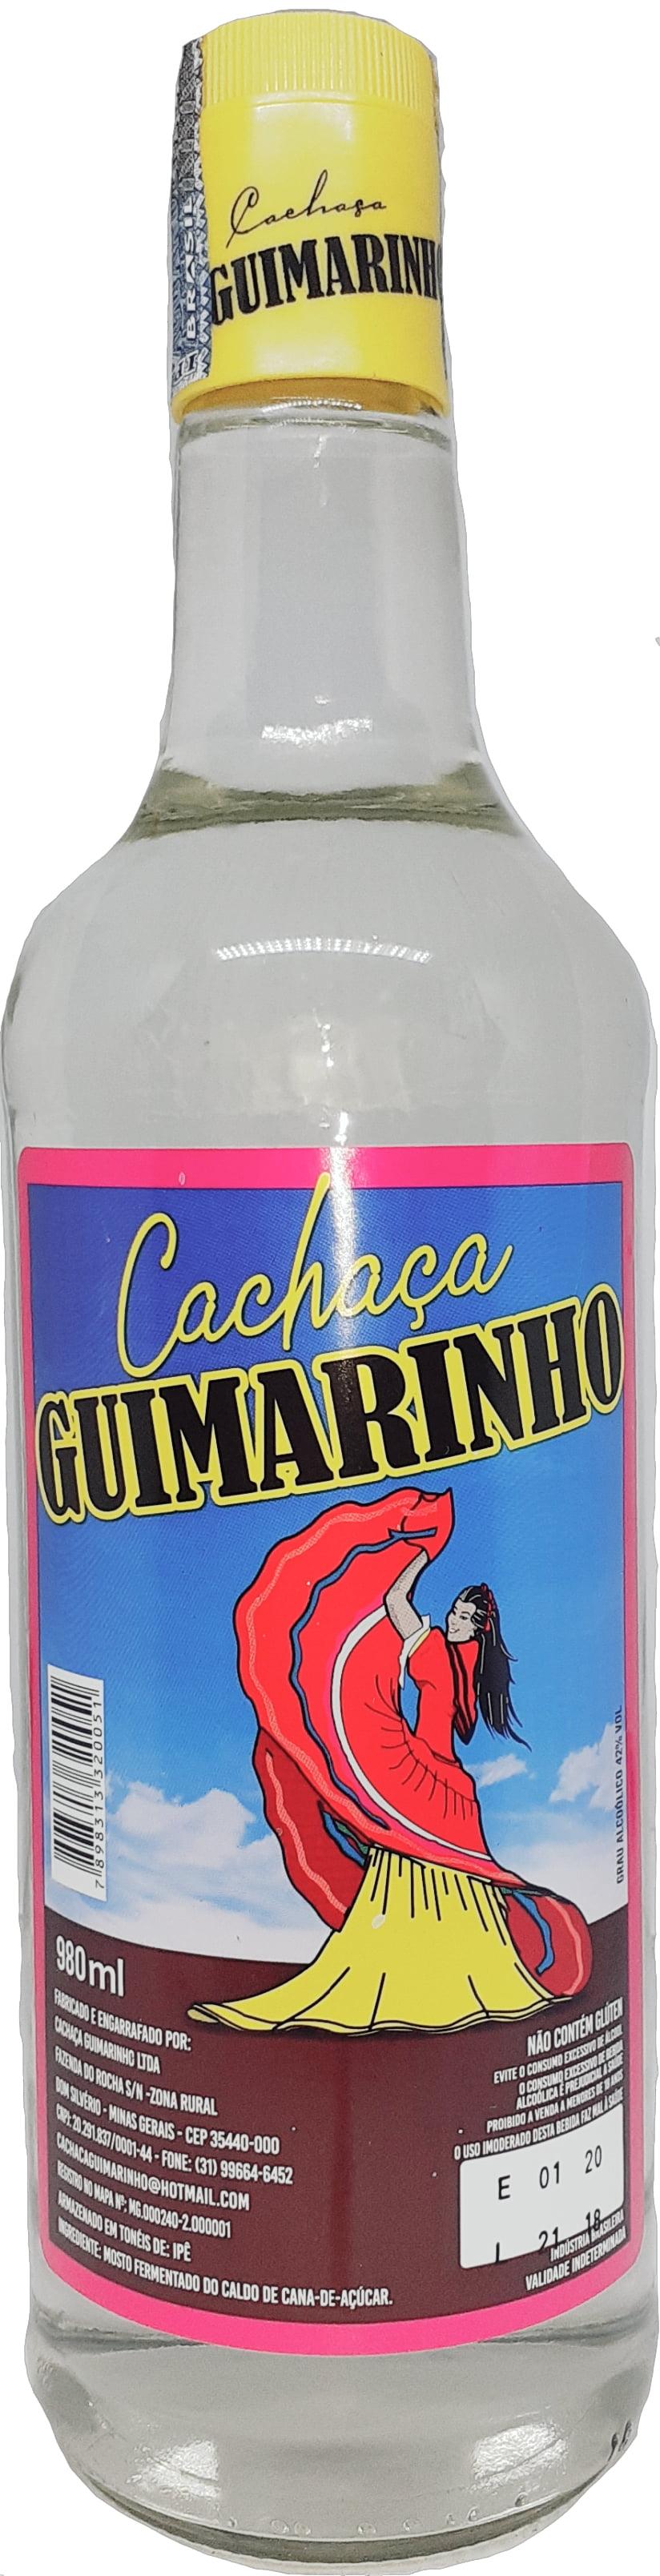 Cachaça Guimarinho Prata 980 ml